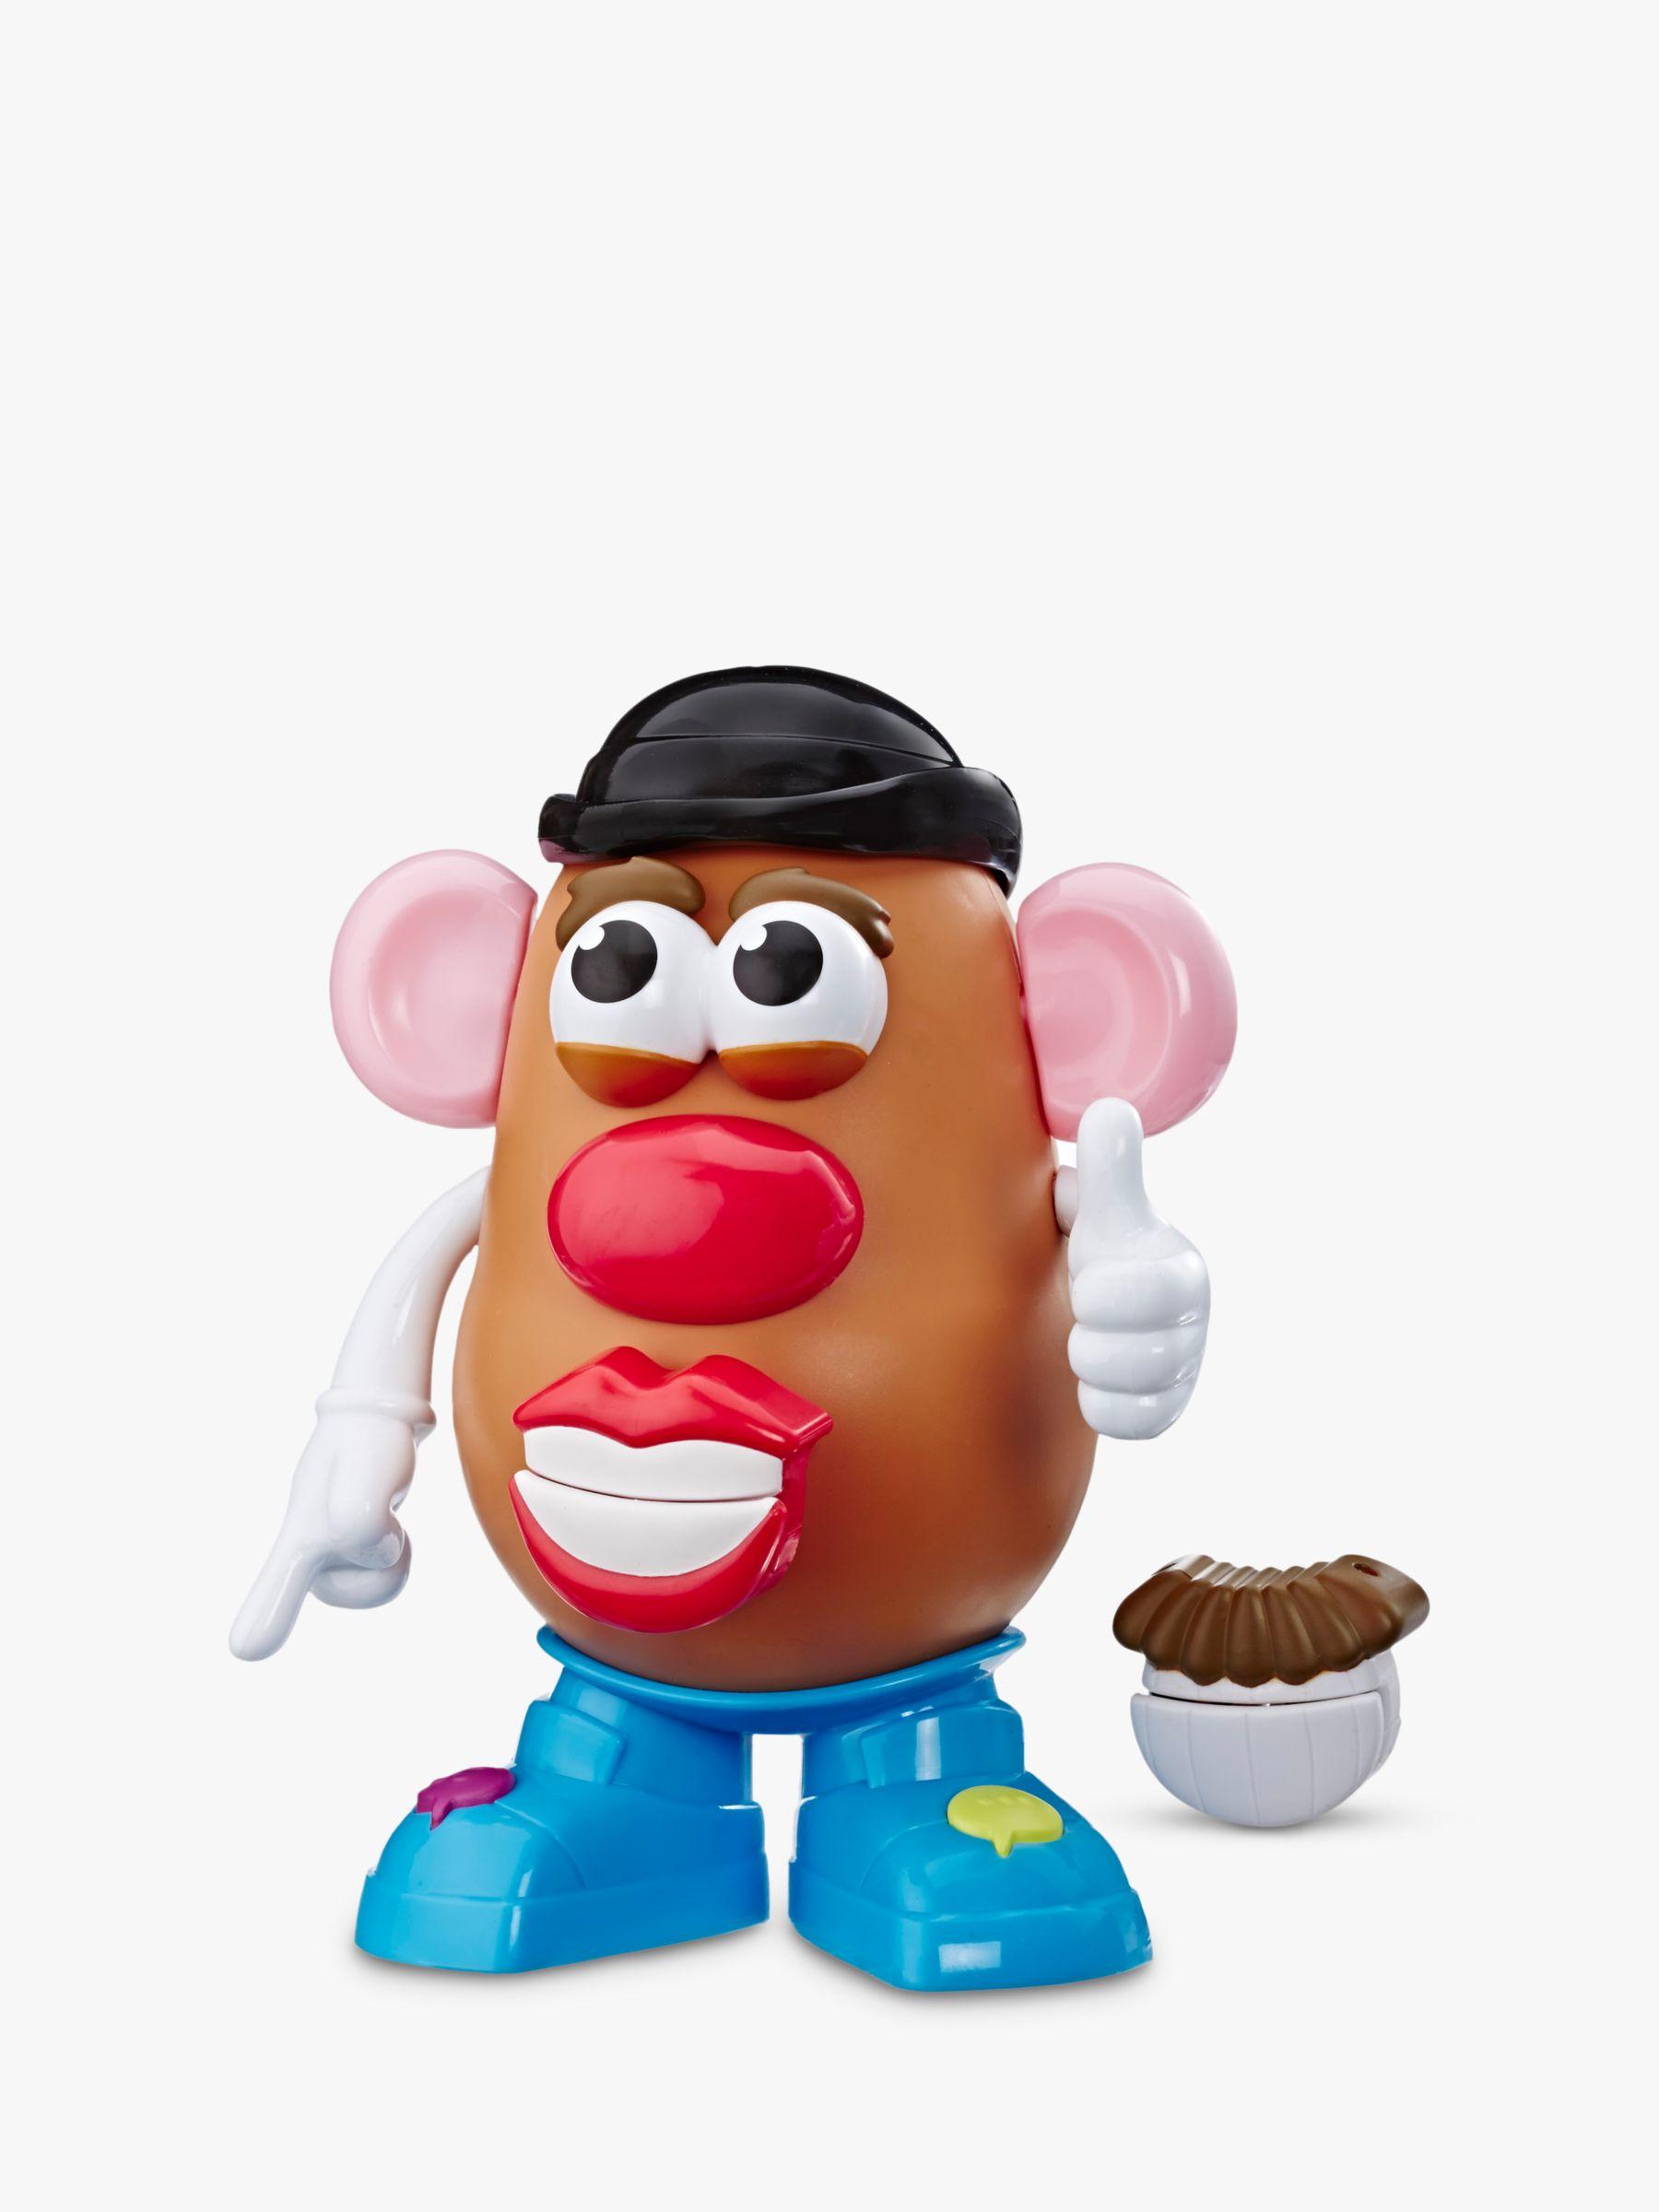 Disney Disney Pixar Toy Story Mr Potato Head Moving Lips